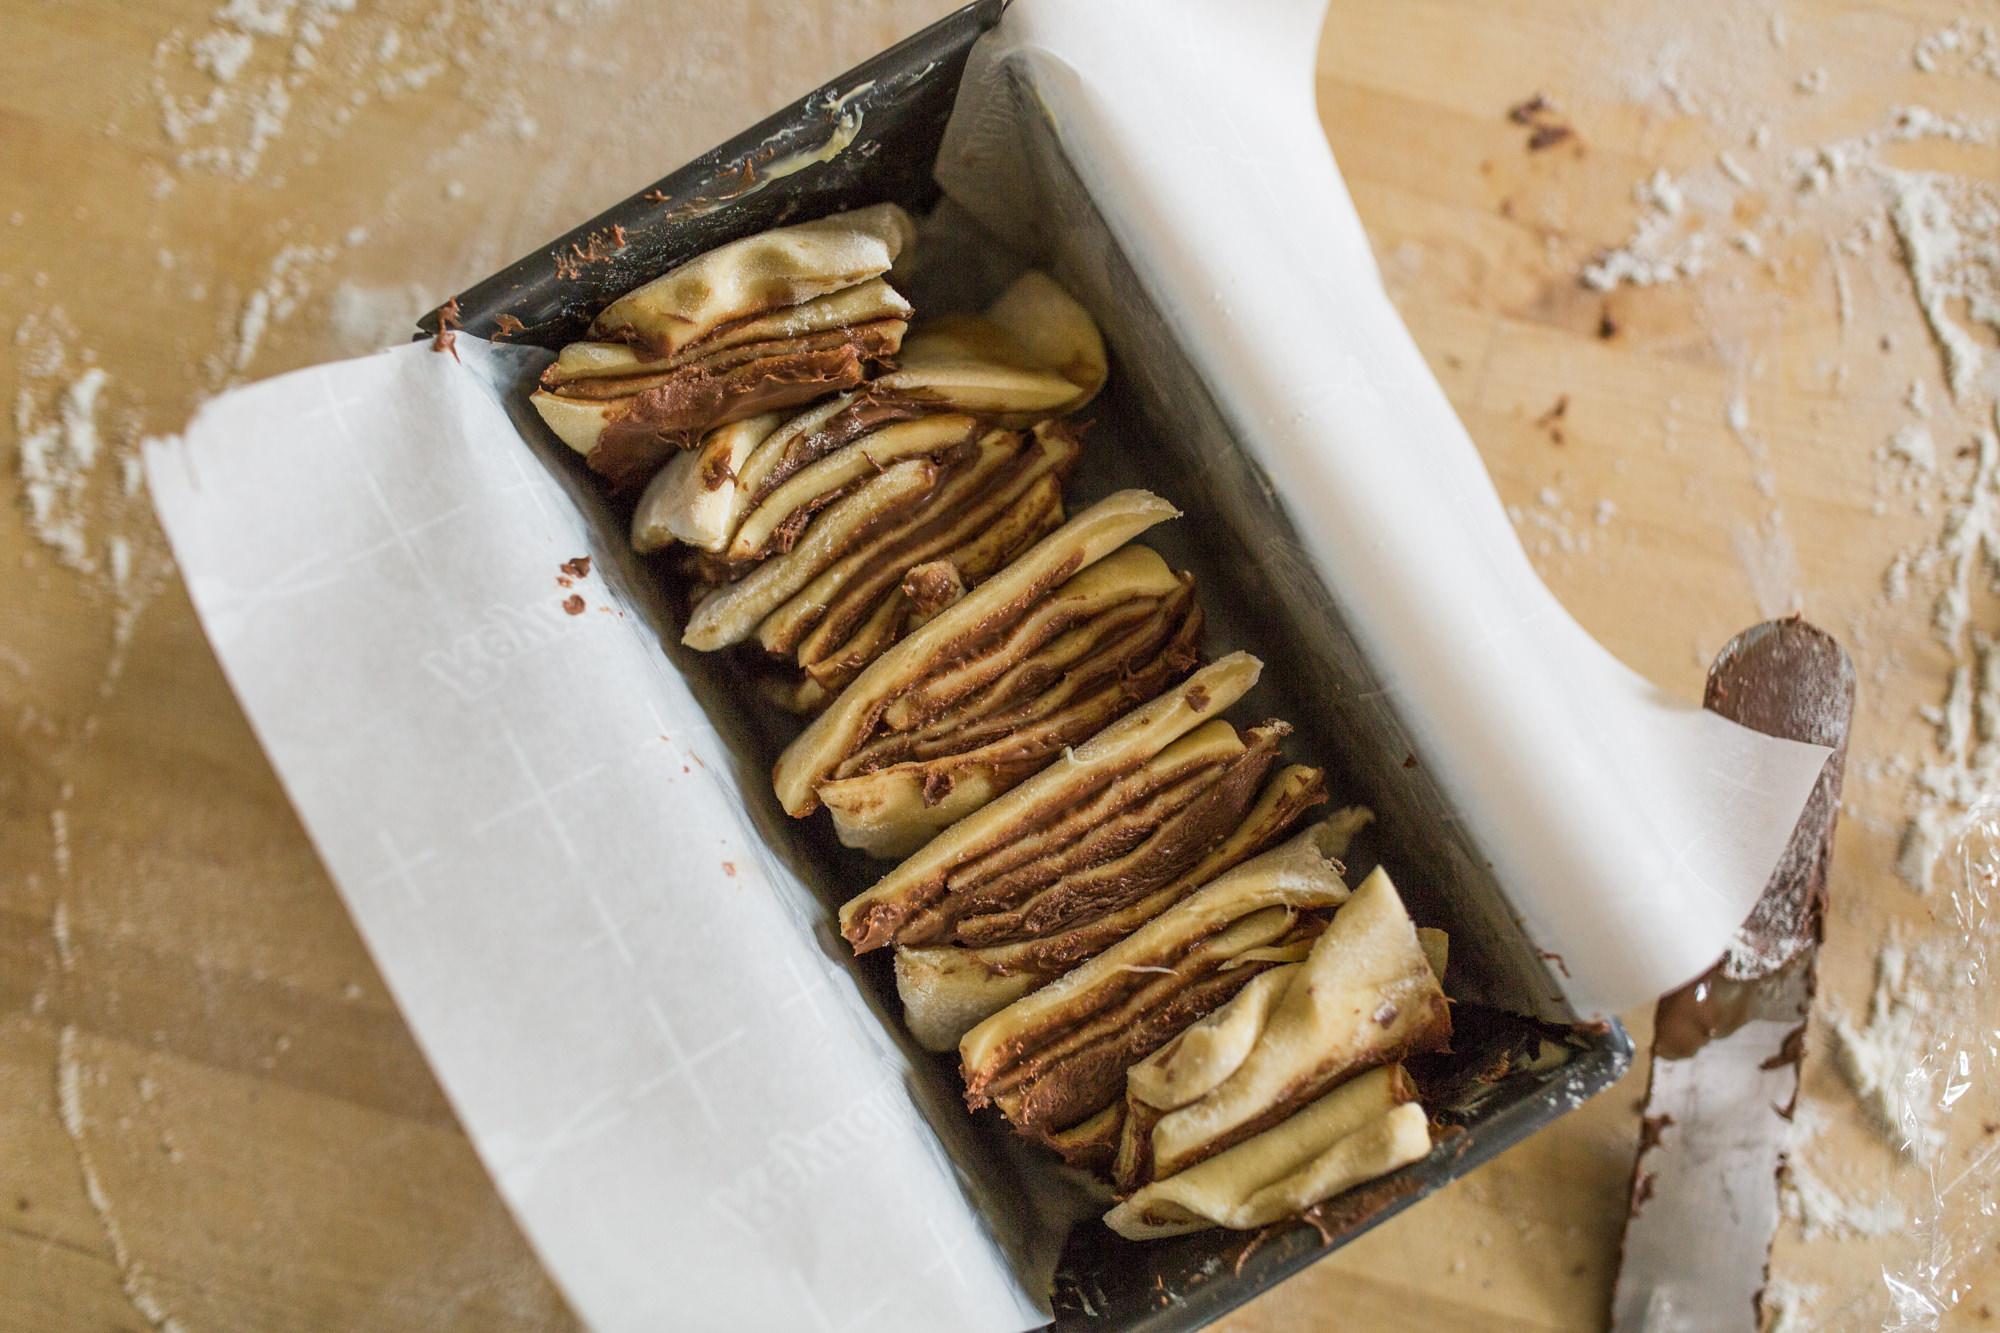 Placing Dough In Baking Dish